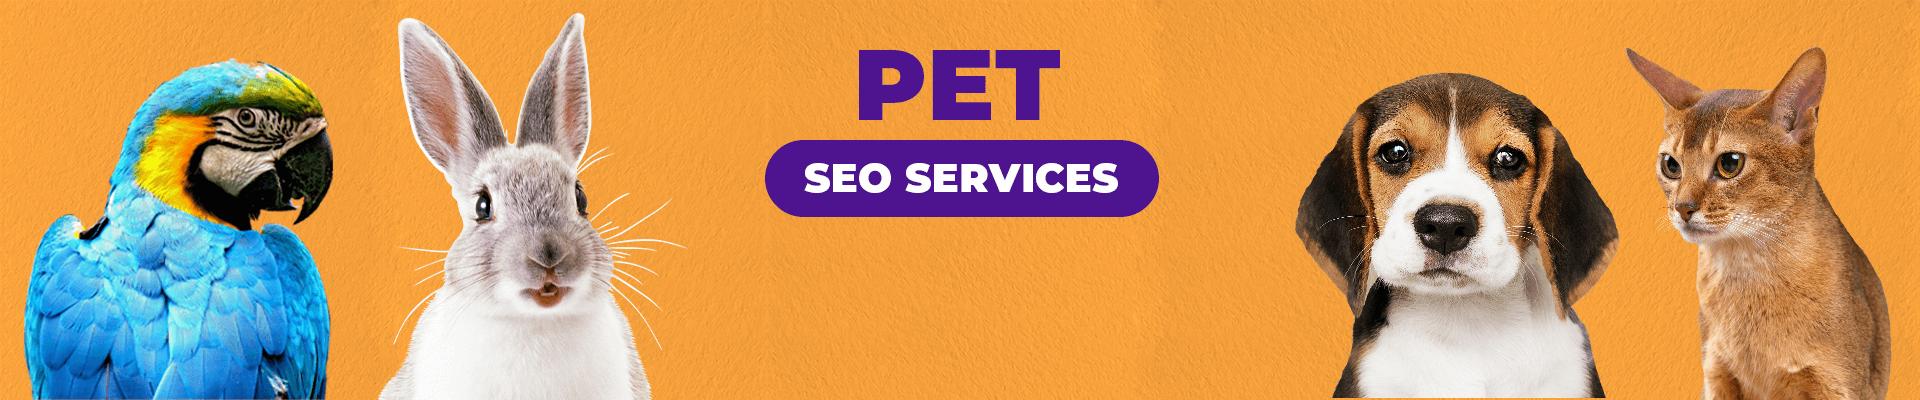 Best Pet SEO Services Company   Pet SEO Expert For Hire